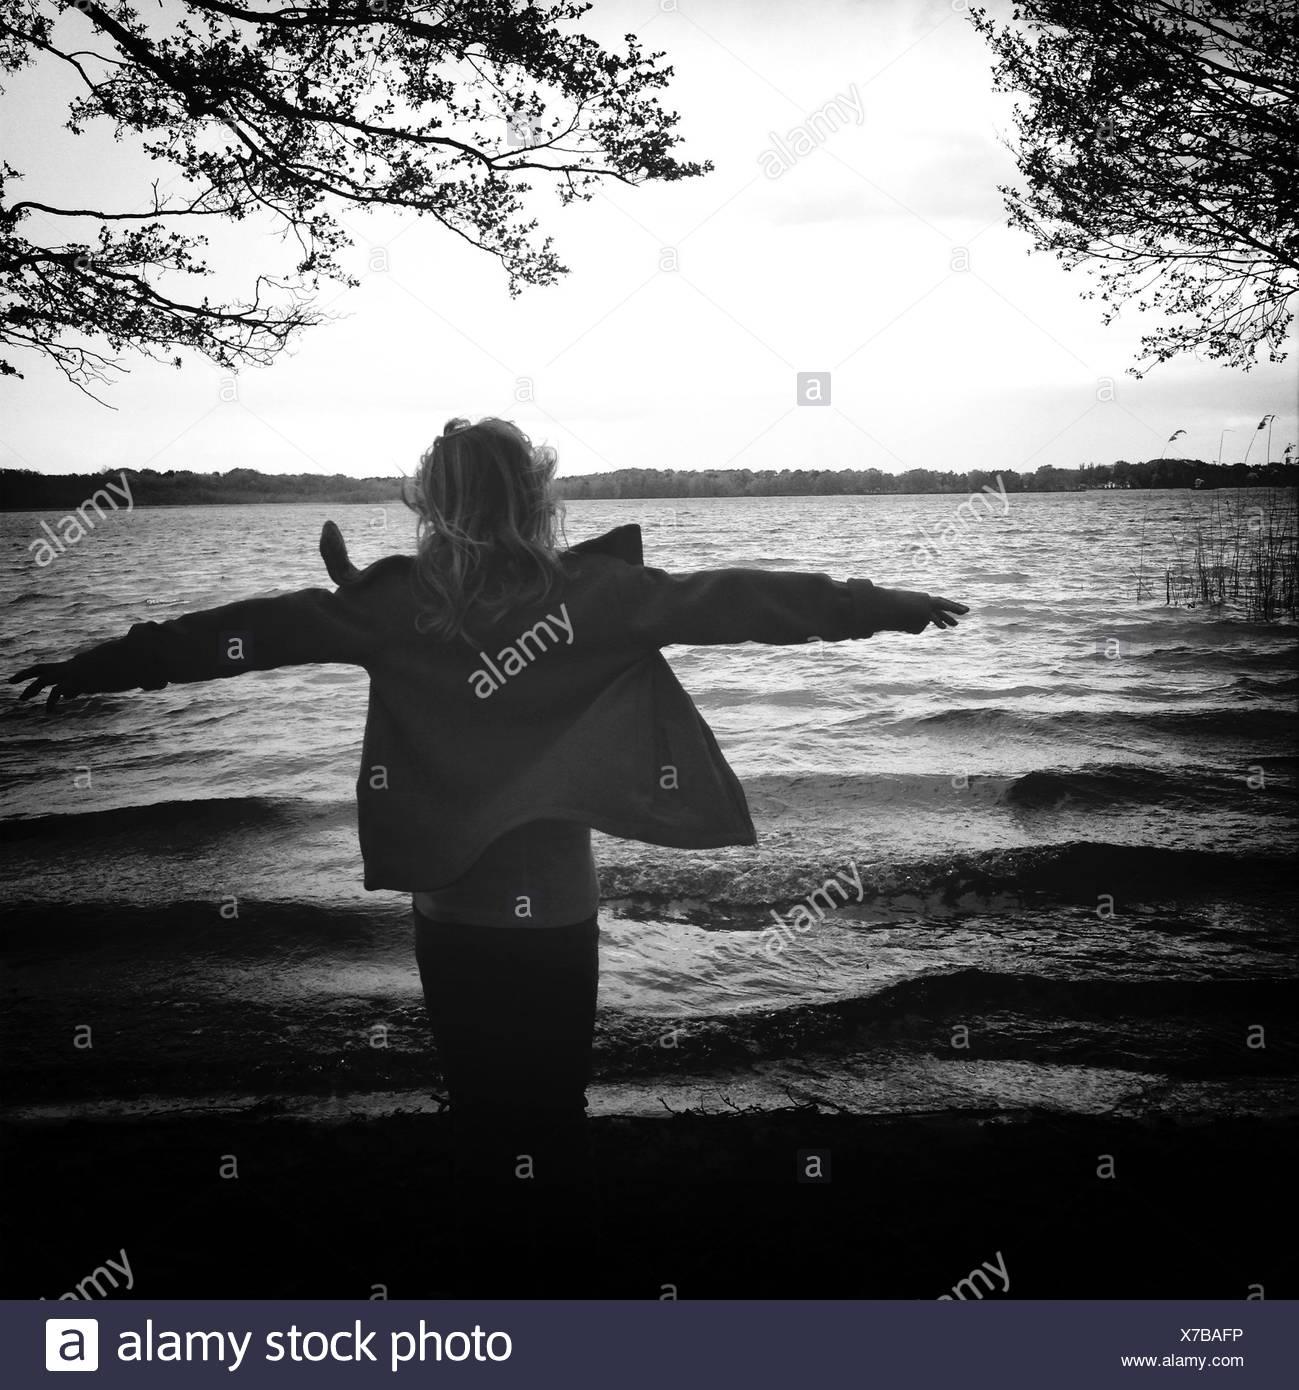 Rear View Of Woman Enjoying Wind At Shore - Stock Image